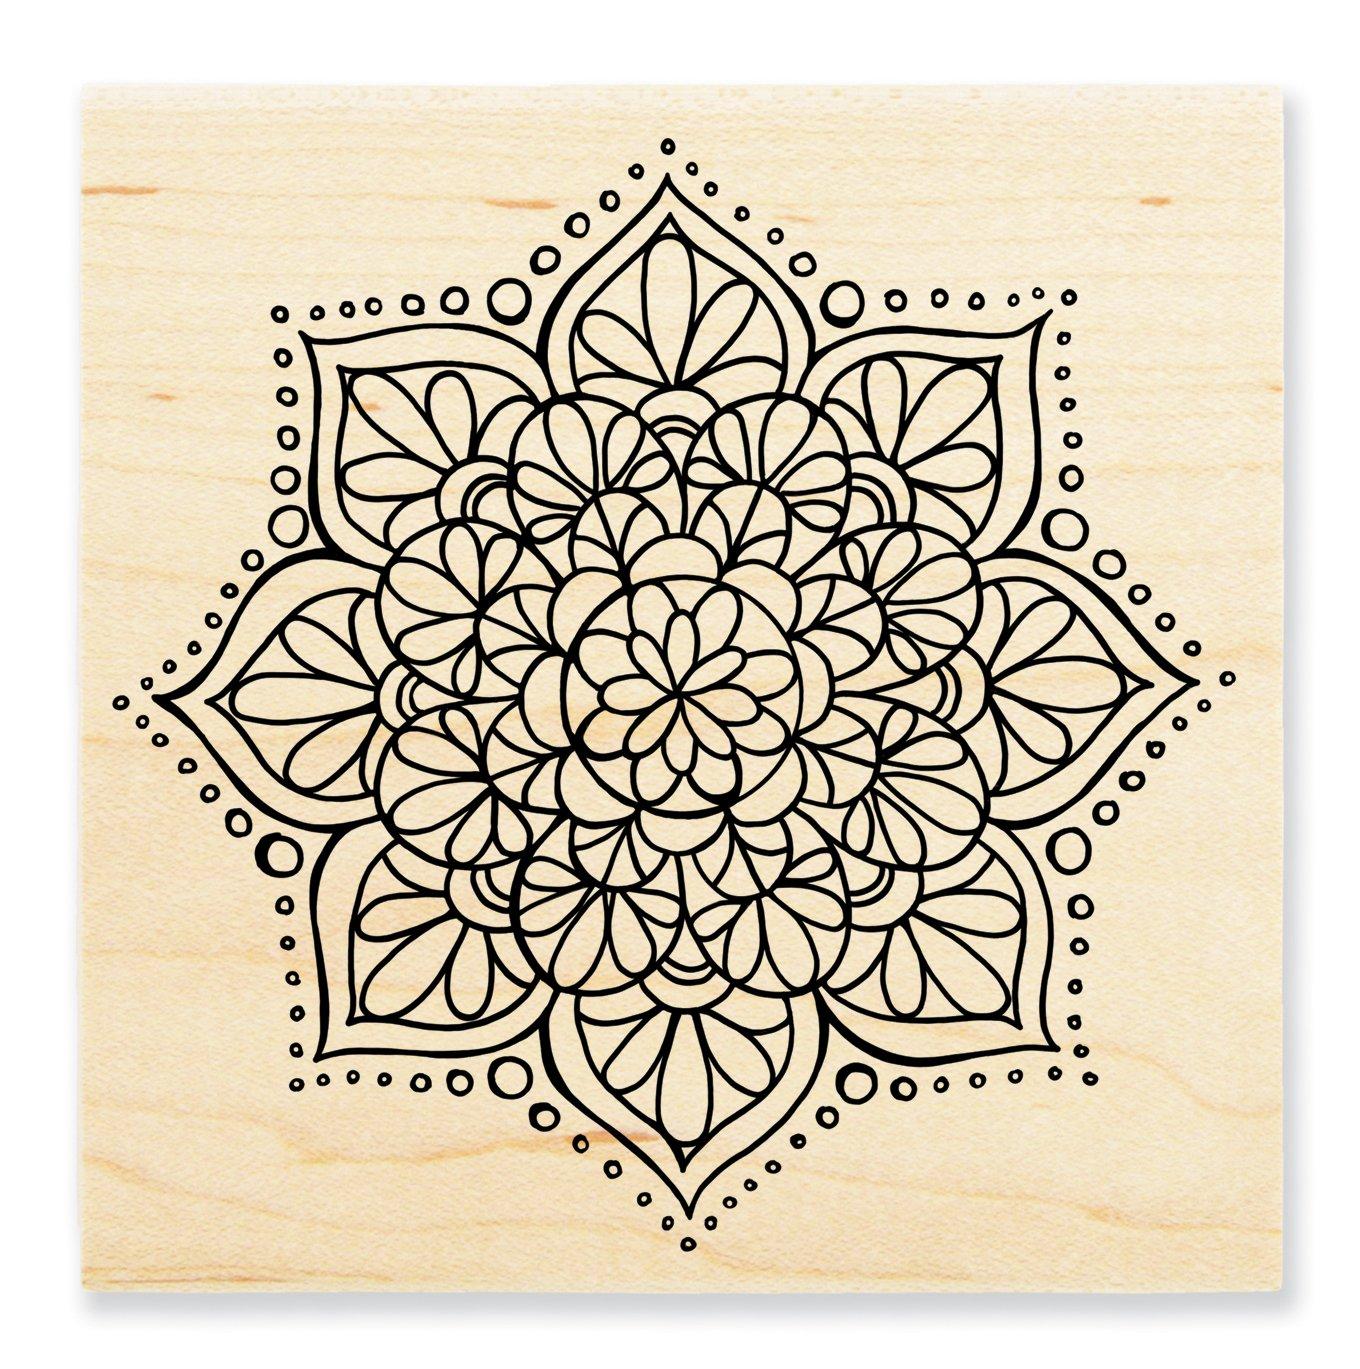 STAMPENDOUS Wood Rubber Stamp Mandala Flower